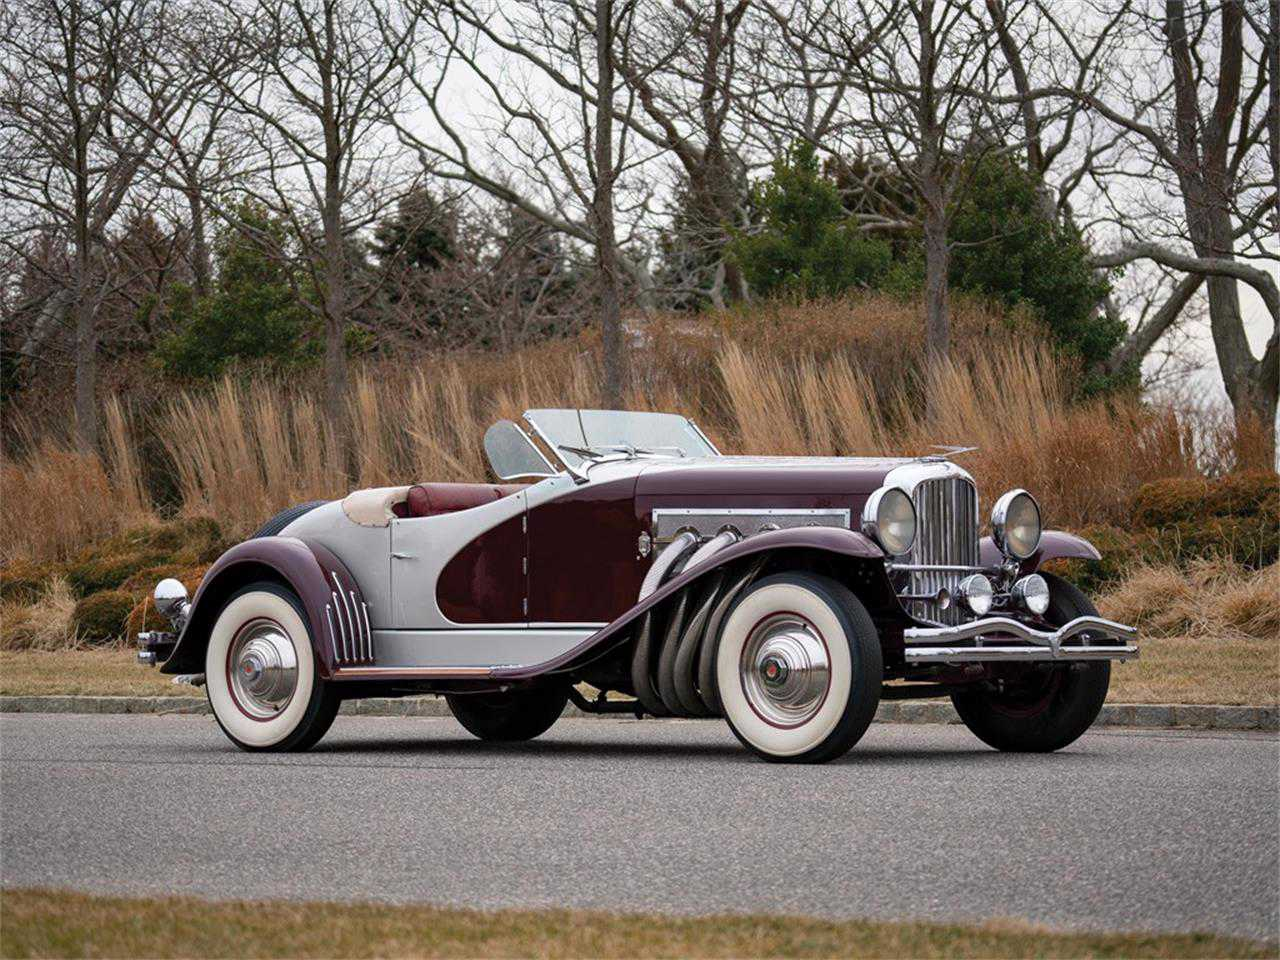 Duesenberg For Sale >> 1935 Duesenberg Ssj Speedster Replica For Sale In Palm Beach